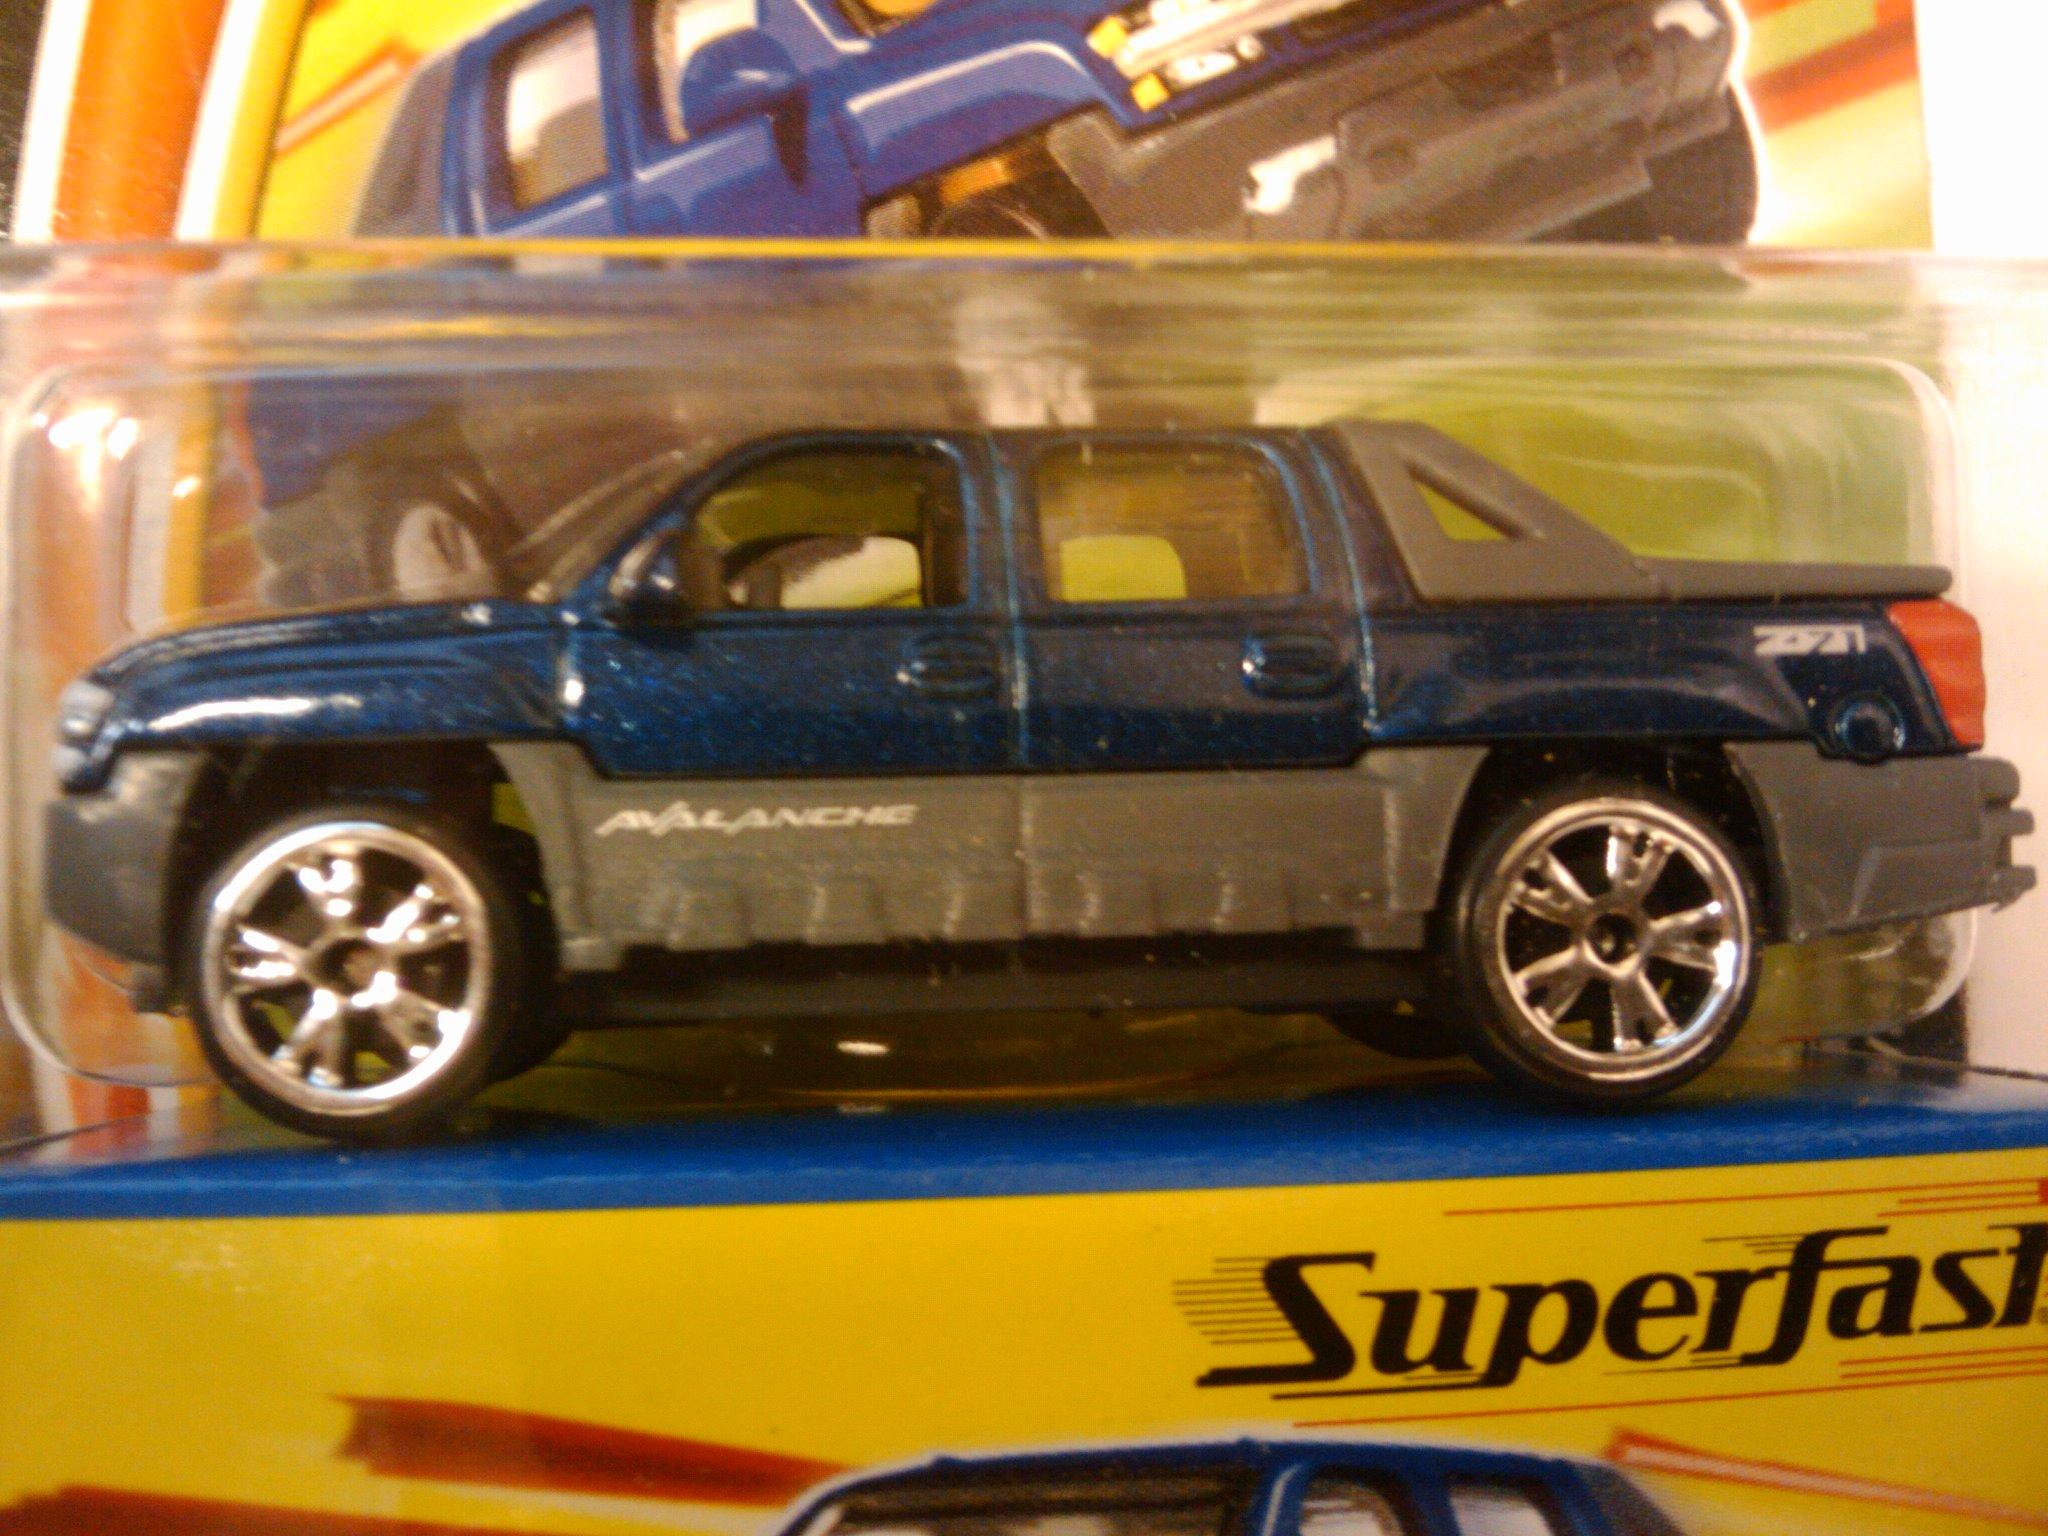 Chevrolet Avalanche Matchbox Cars Wiki